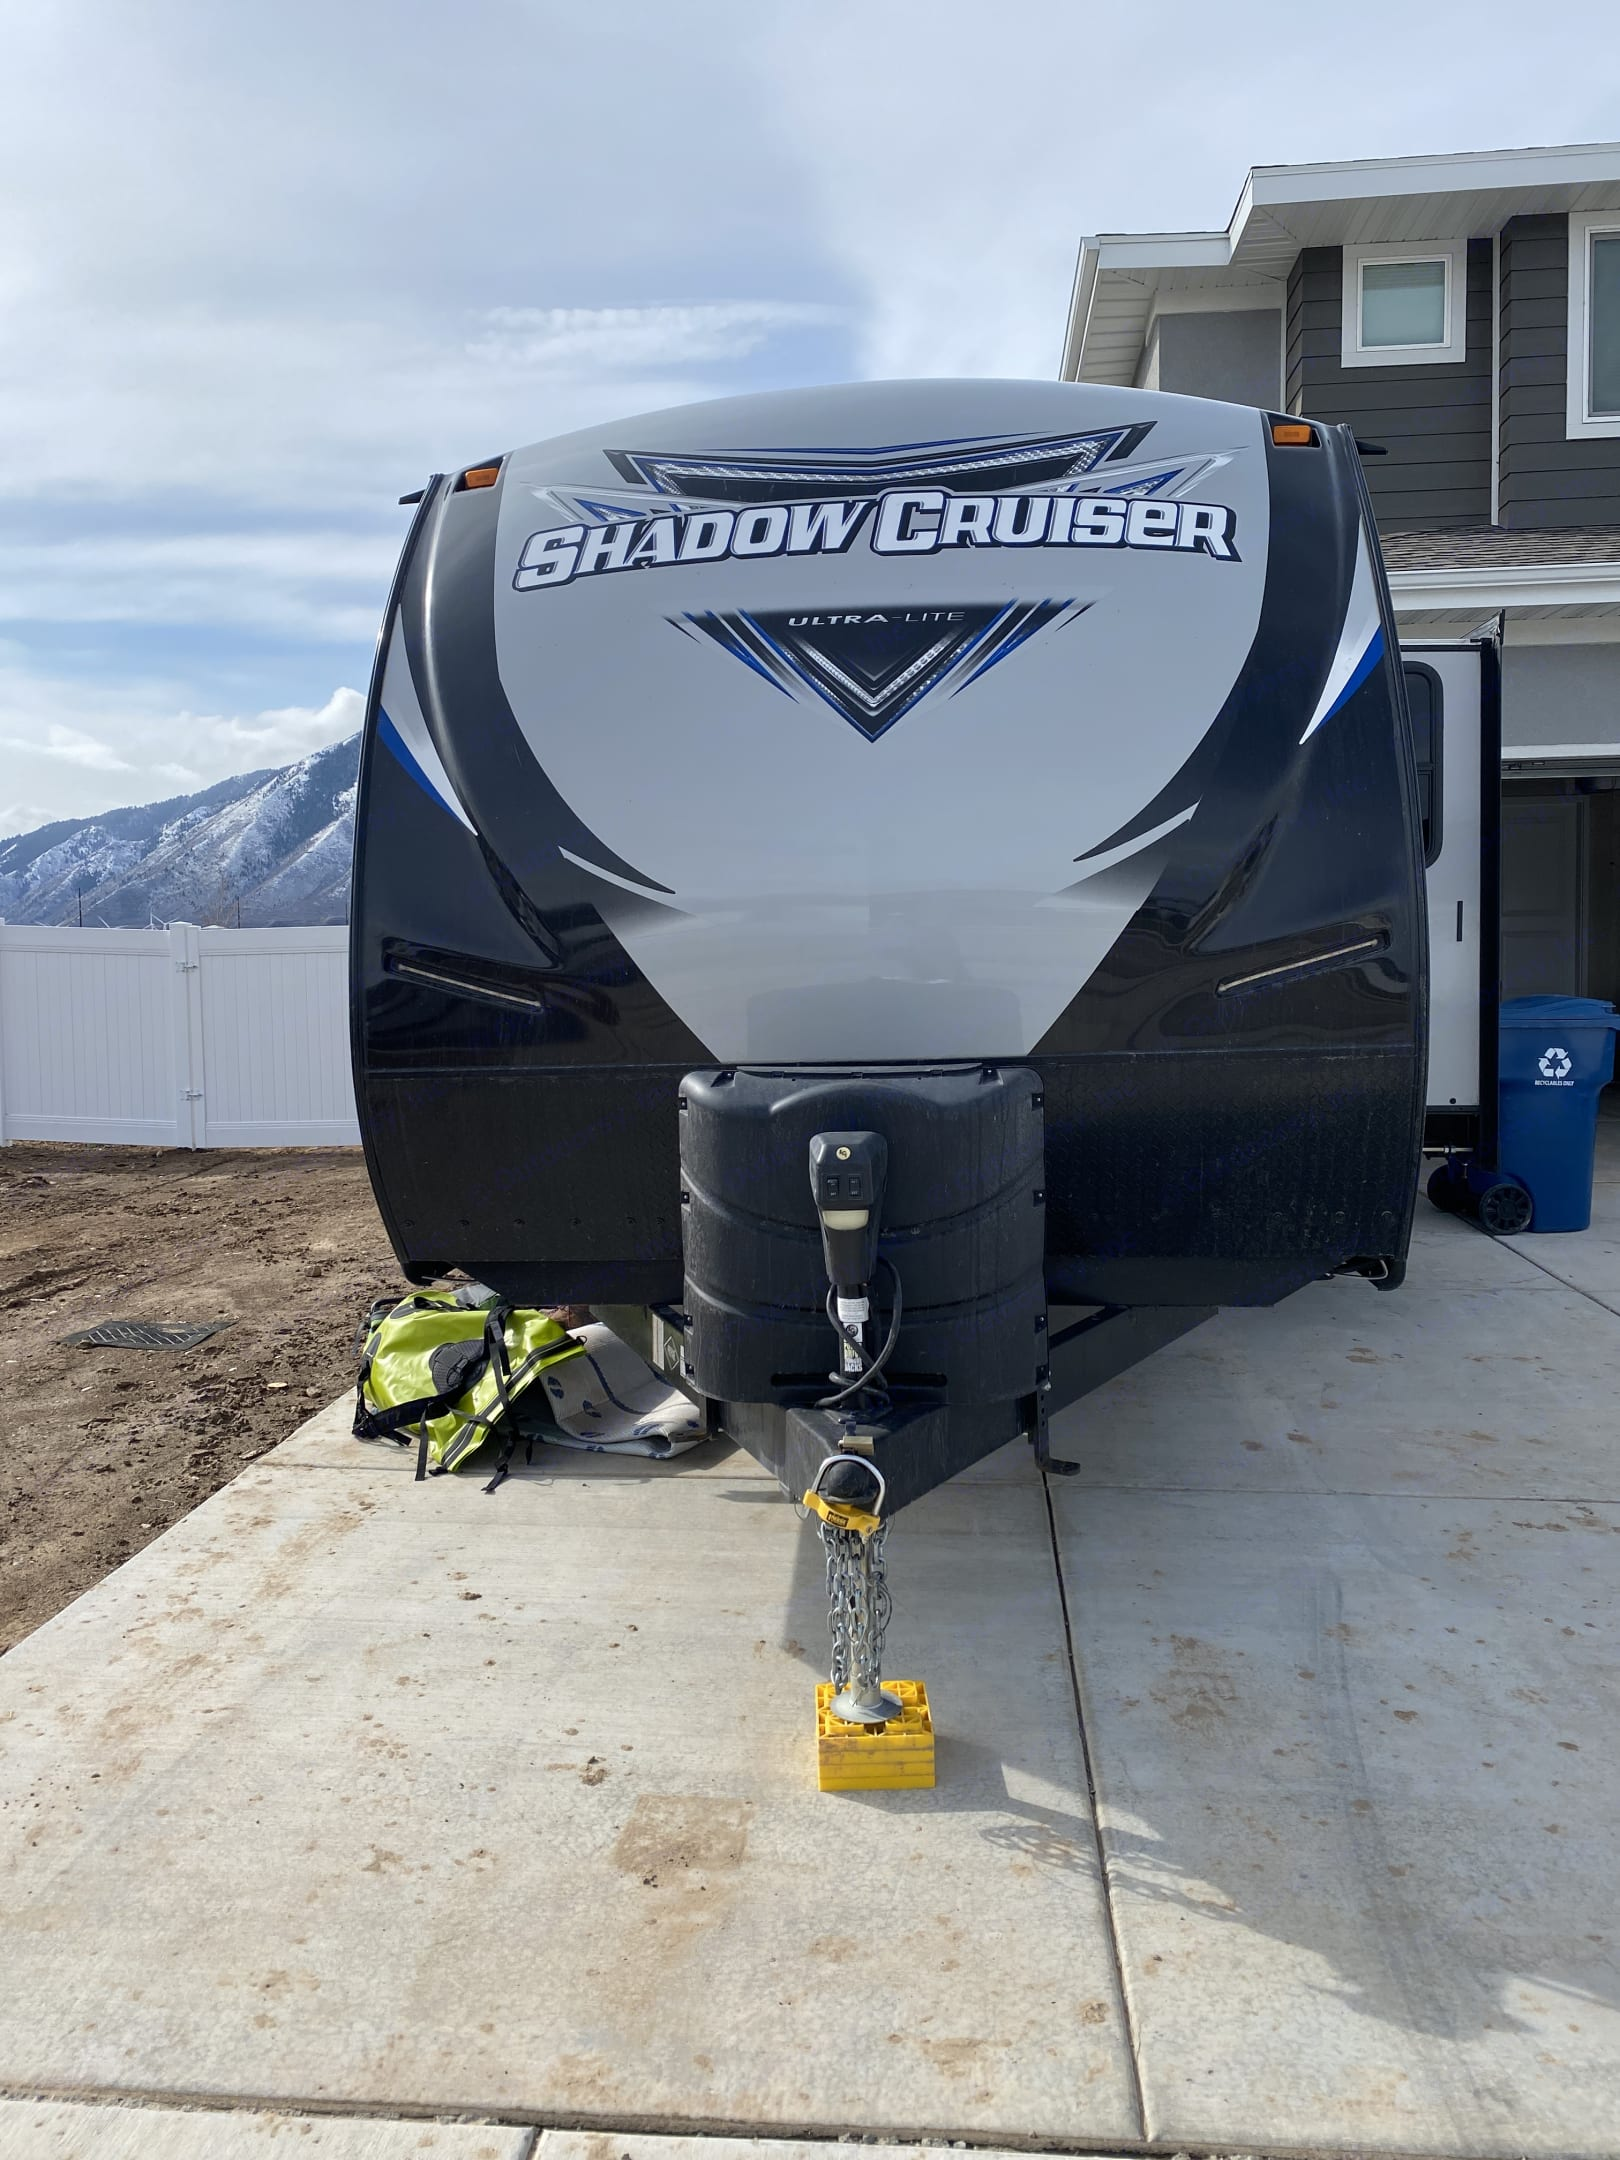 Front of trailer. Cruiser Rv Corp Shadow Cruiser 2018